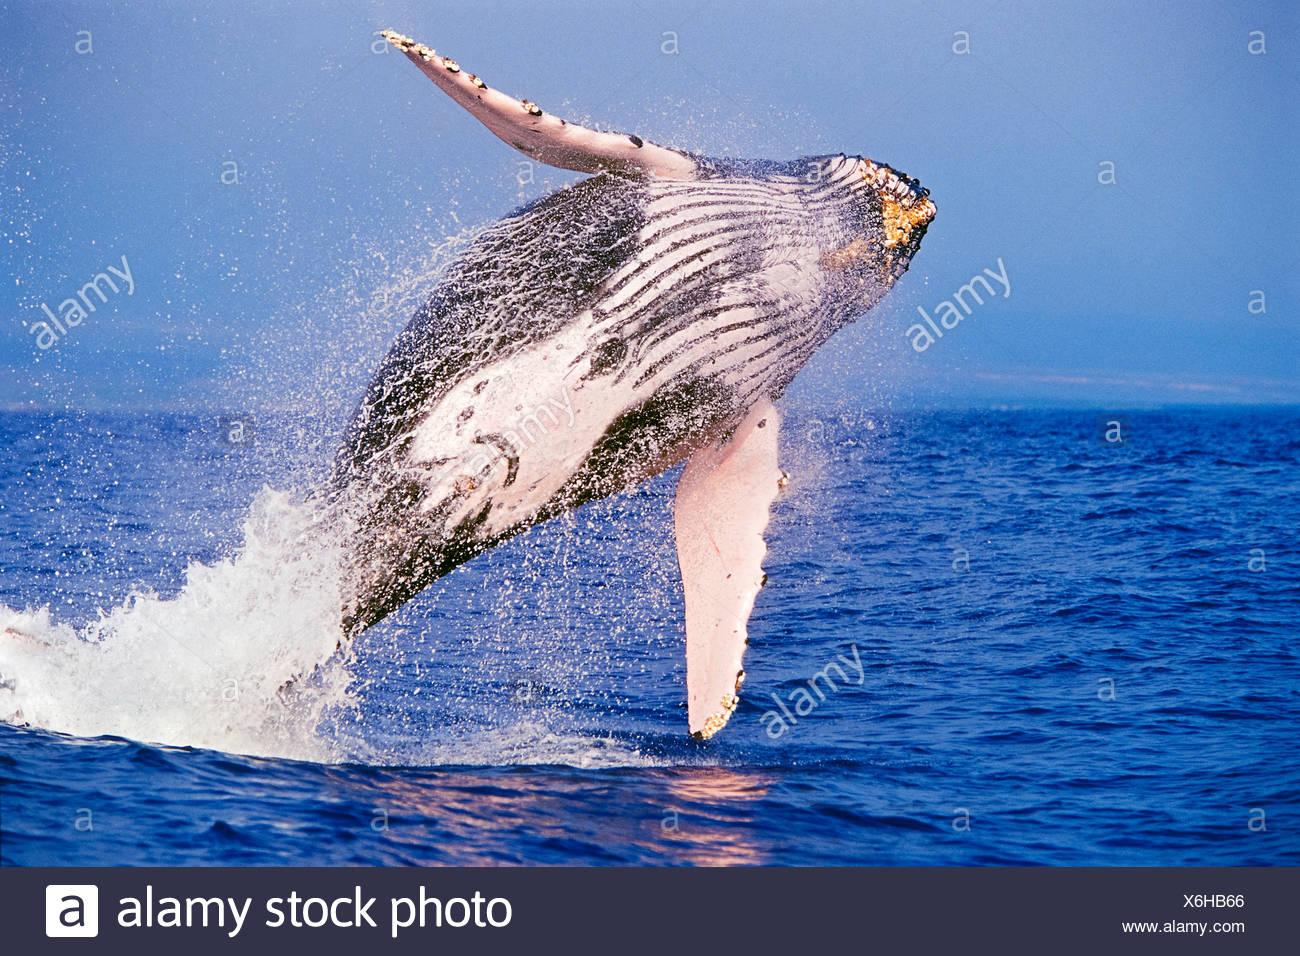 Verletzung der Buckelwal, Impressionen Novaeangliae, Hawaii, USA Stockbild